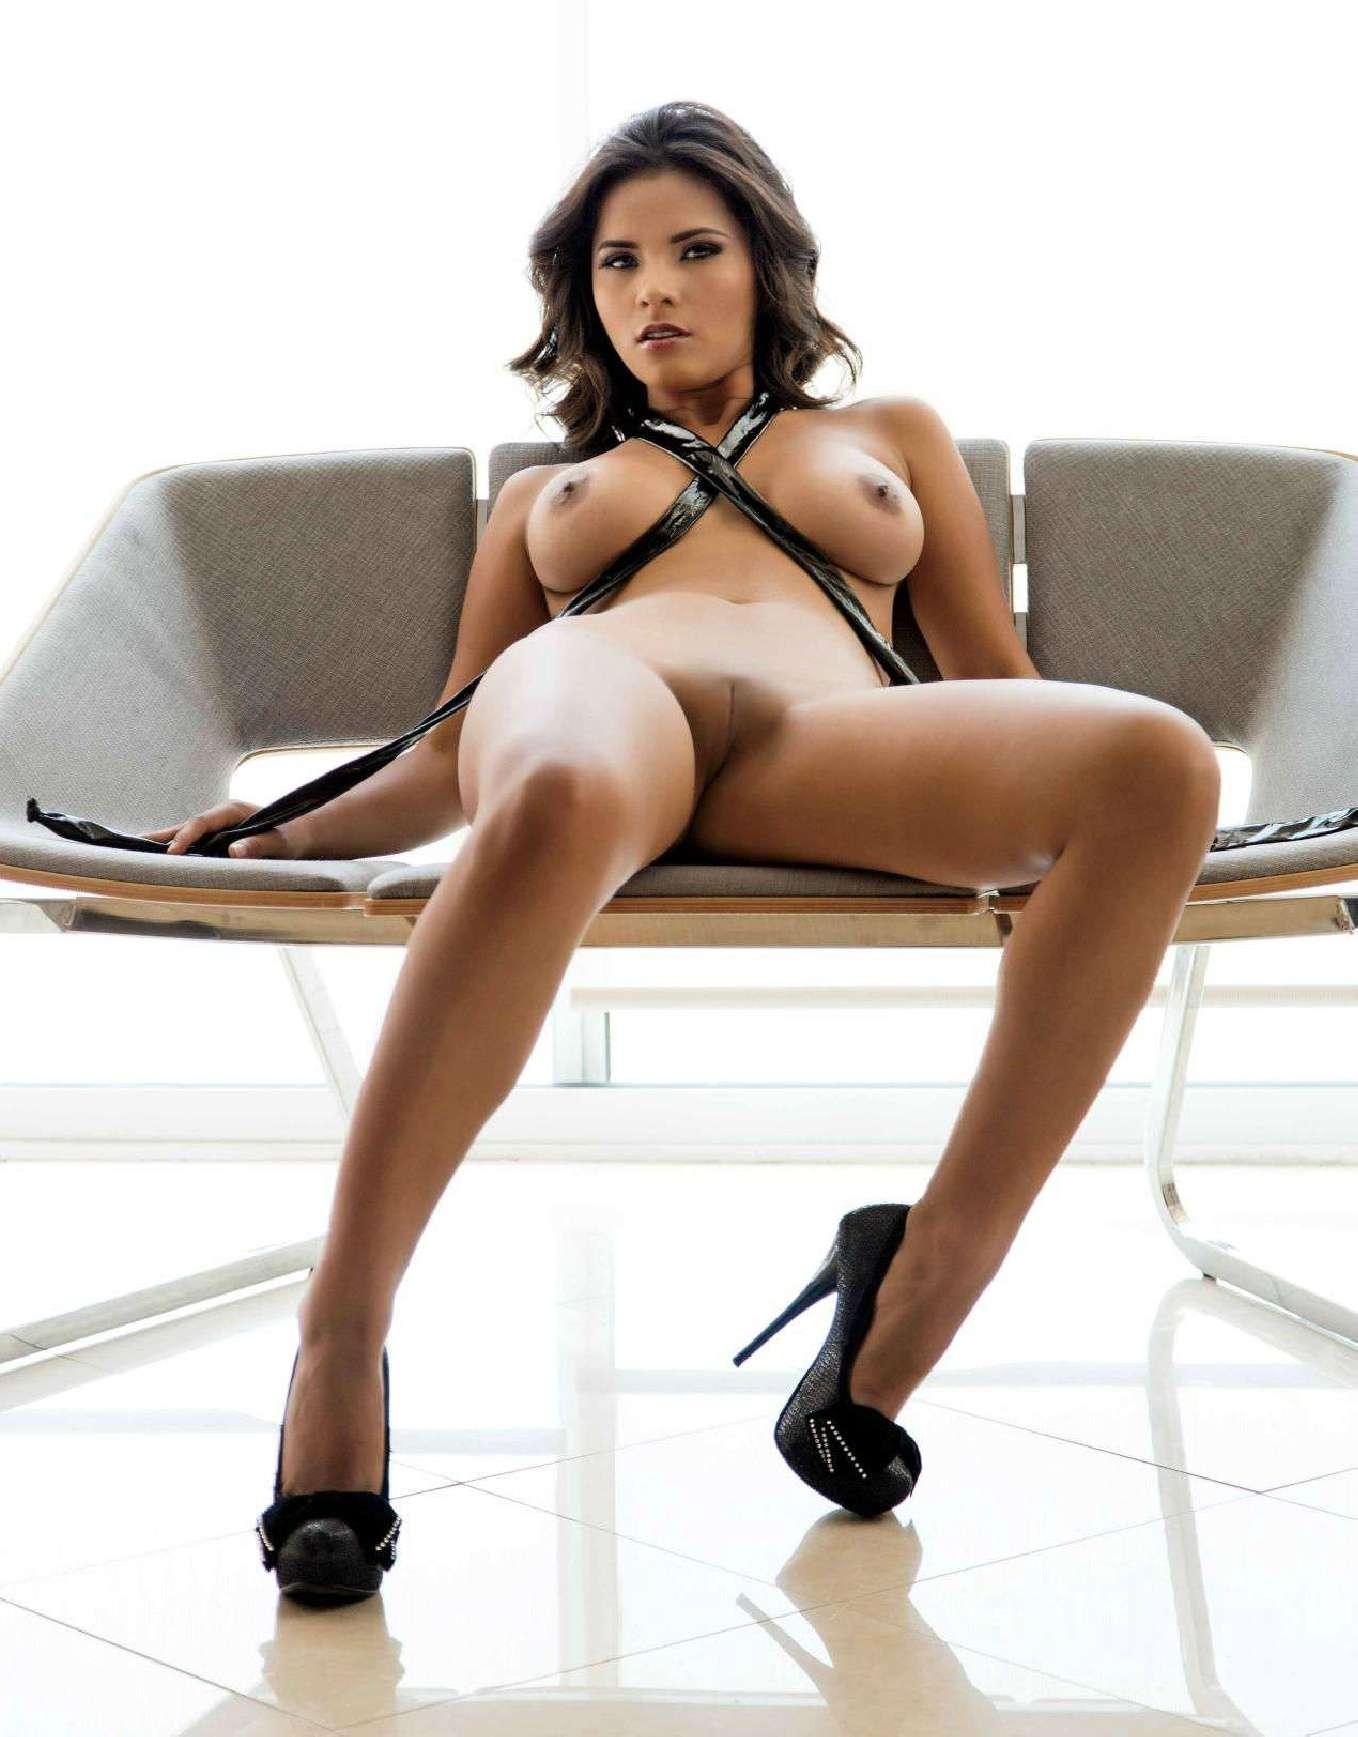 Michelle marino geraldine mt photos nues